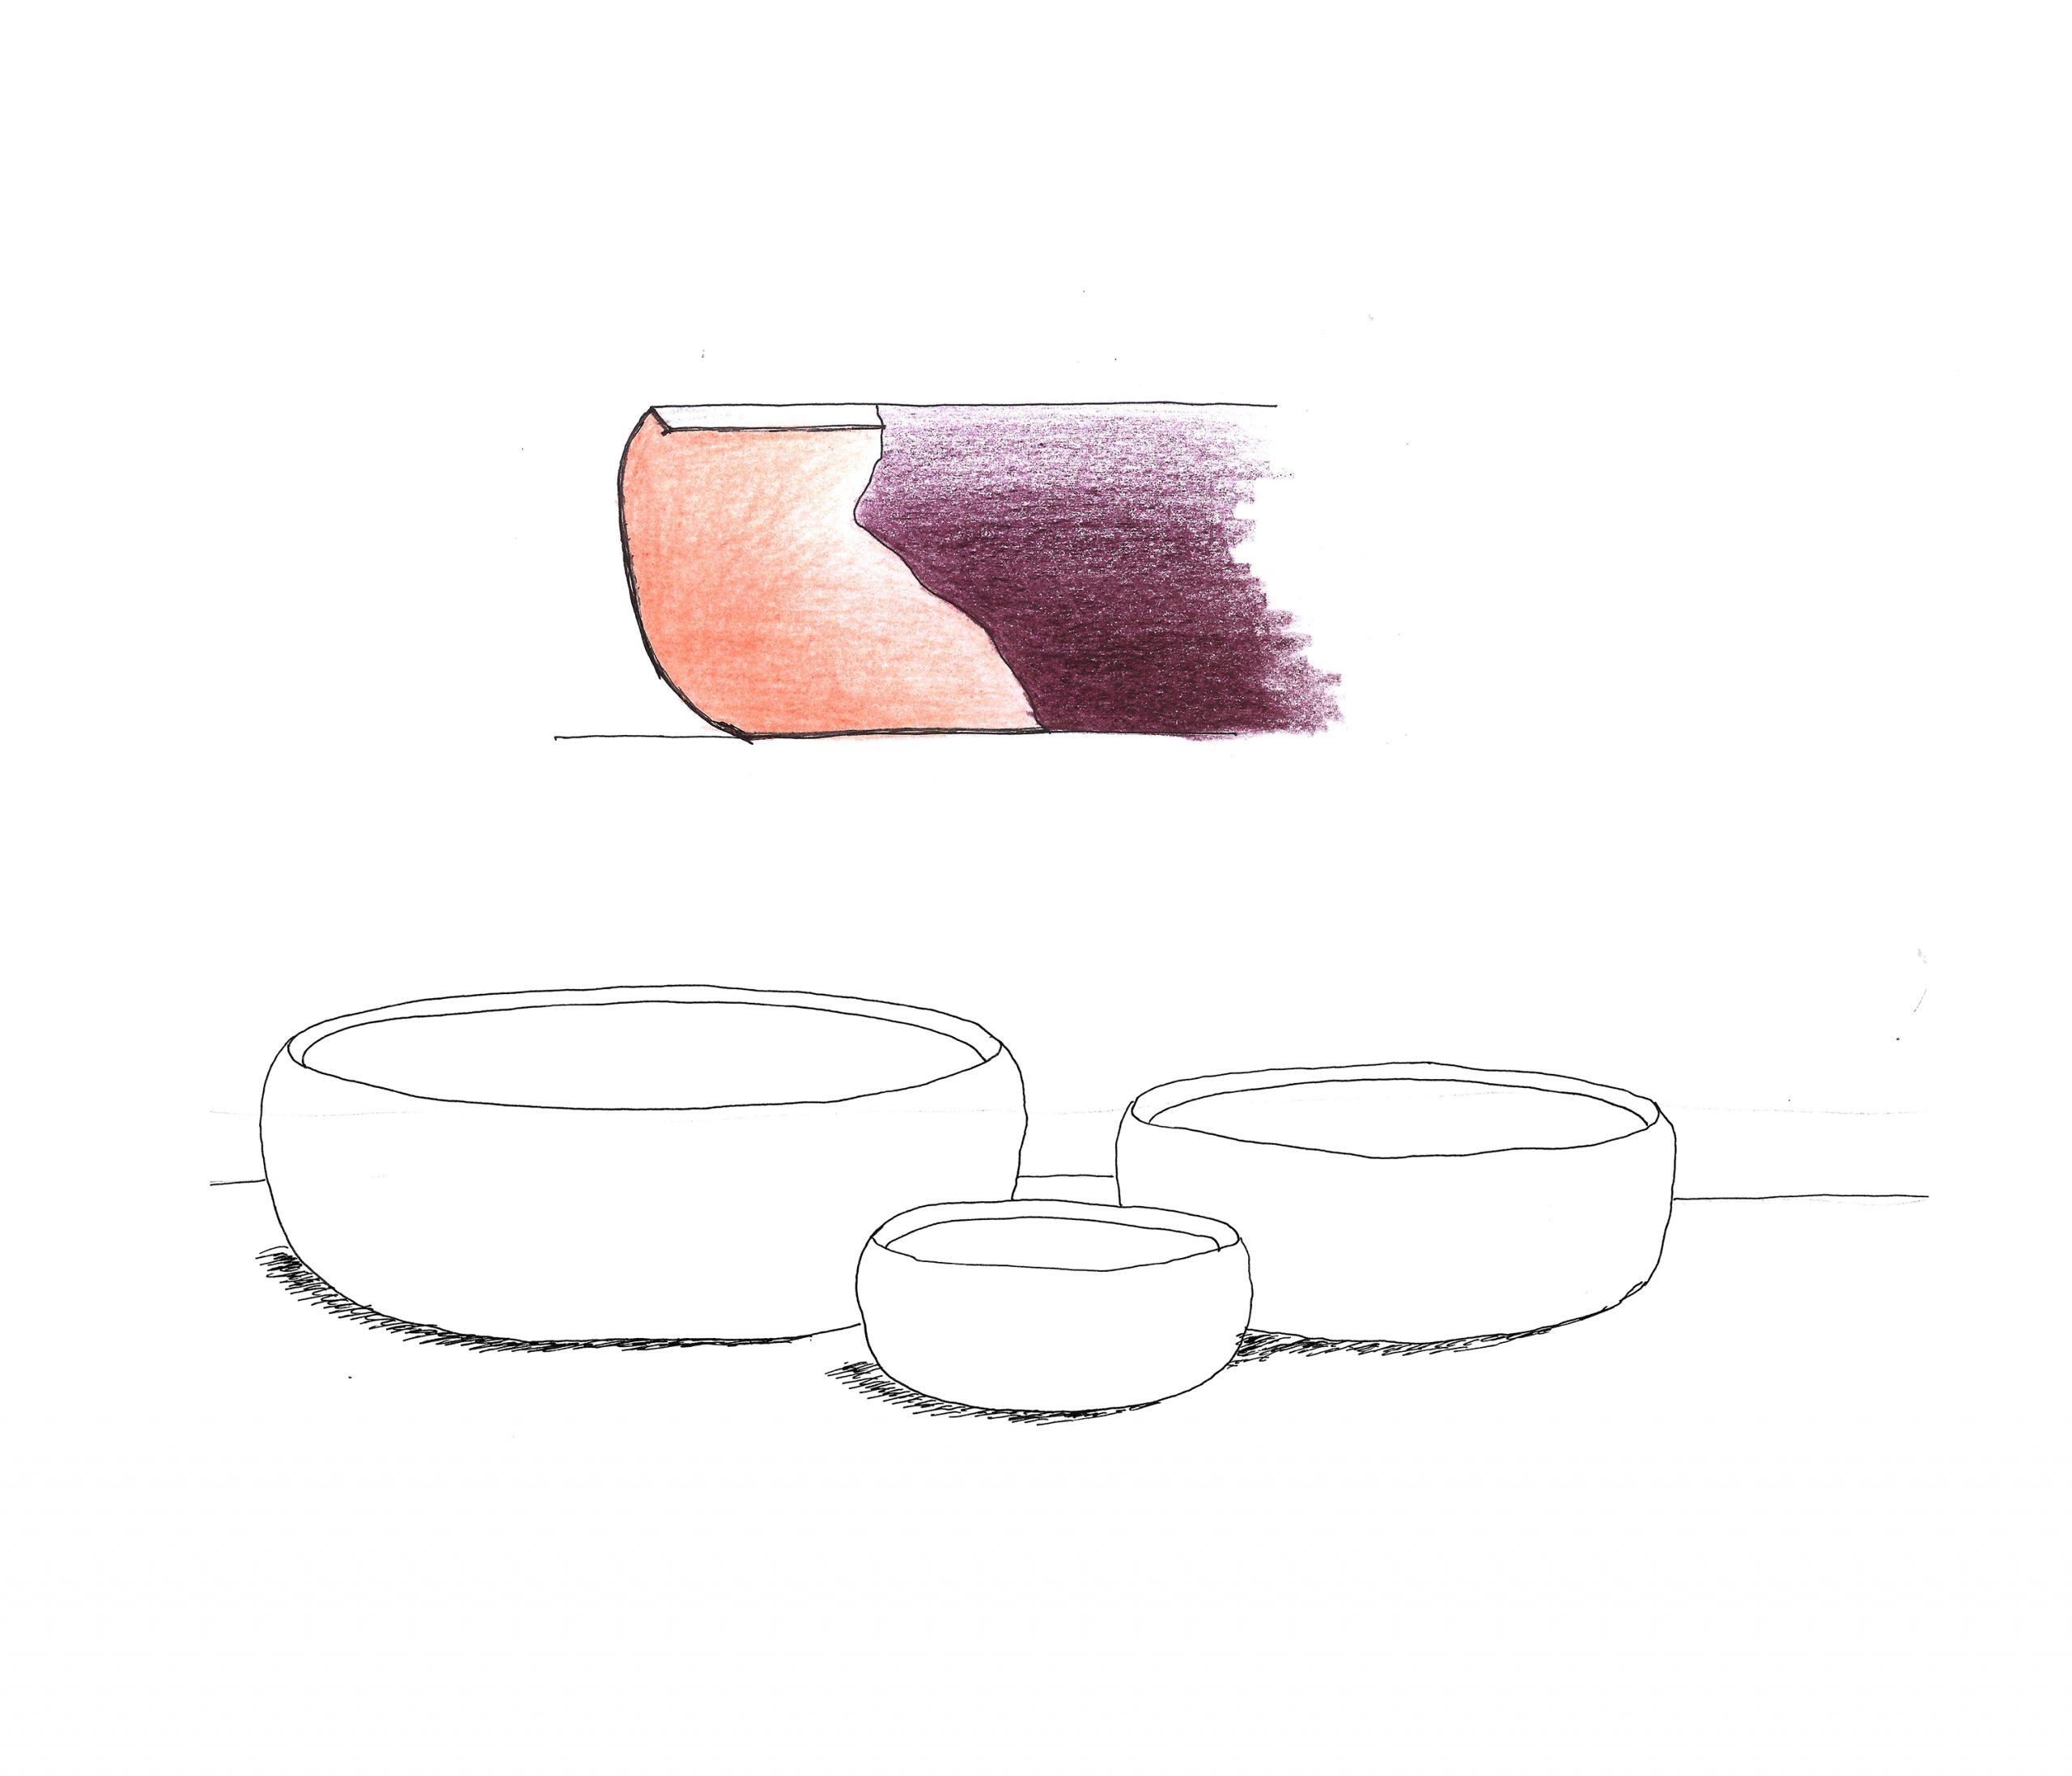 Ora bowls concept sketch by Debiasi Sandri for Stelton